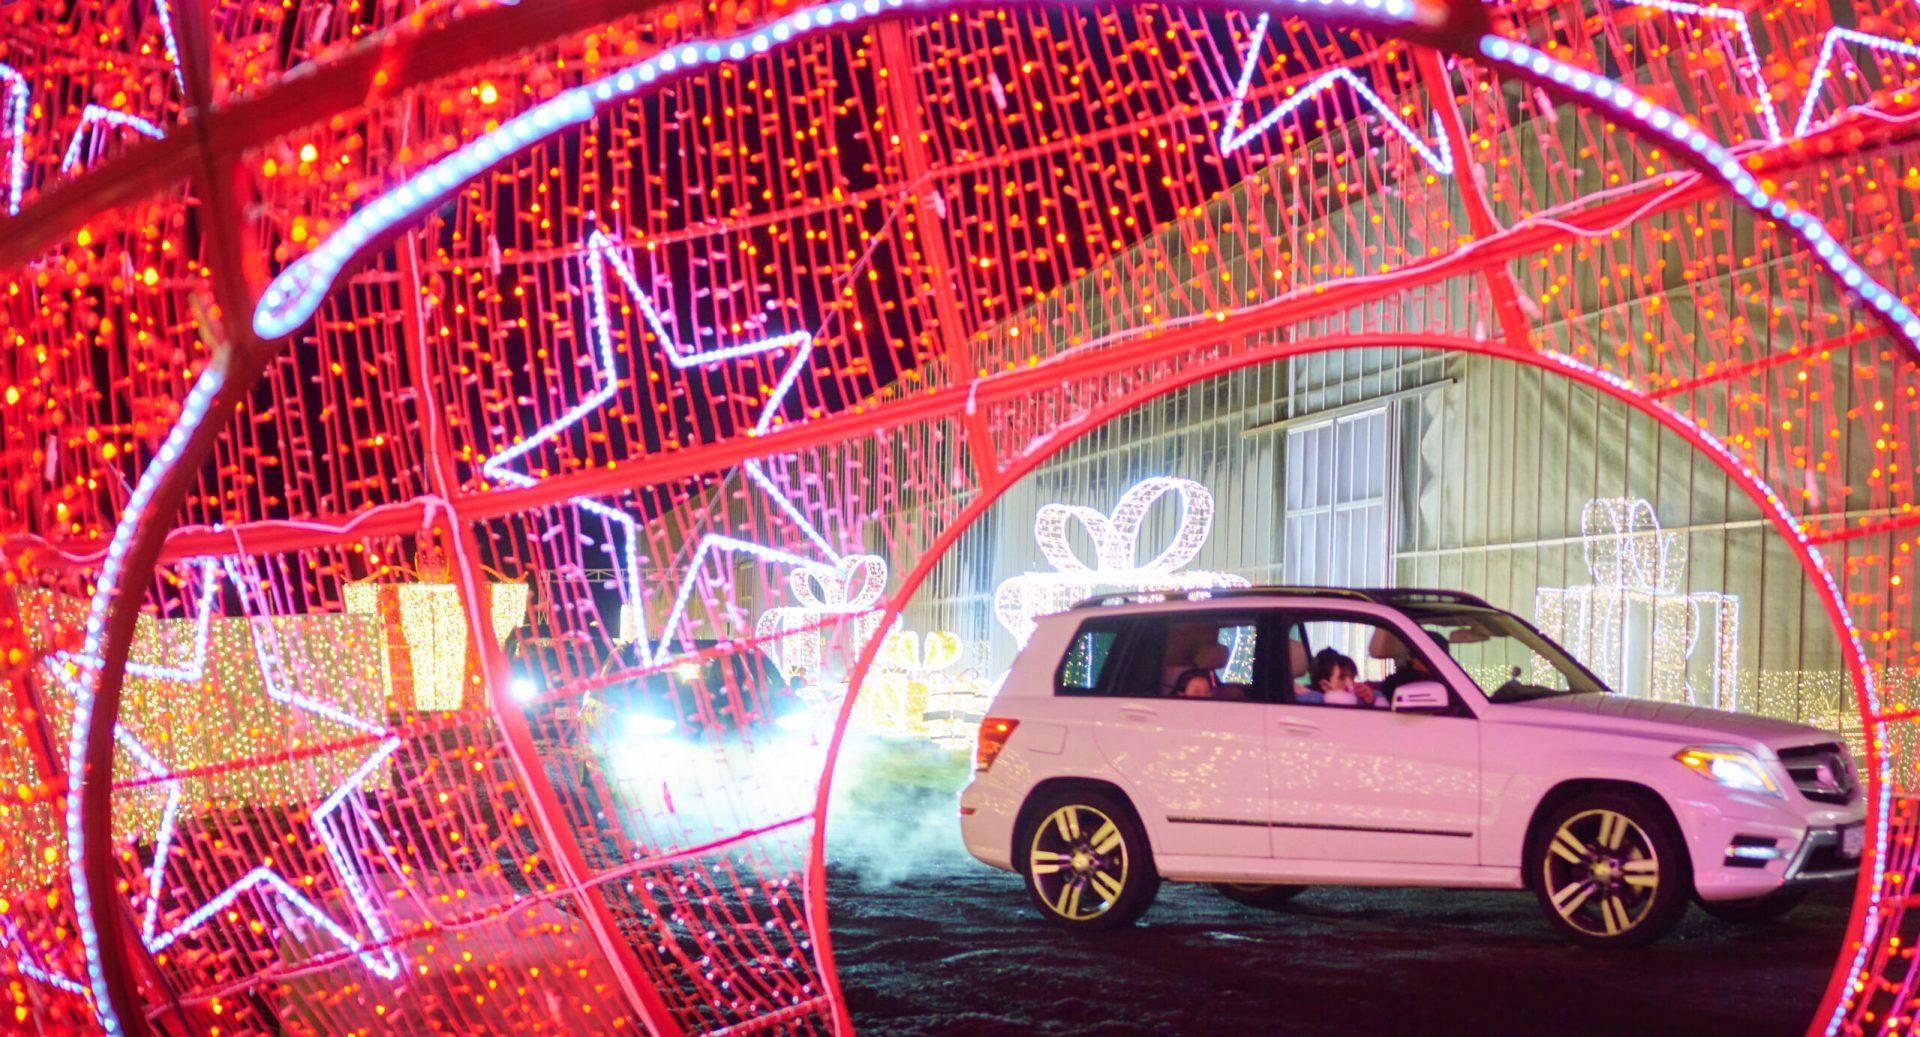 Metro Vancouver's glittering Glow drive-thru returns this holiday season